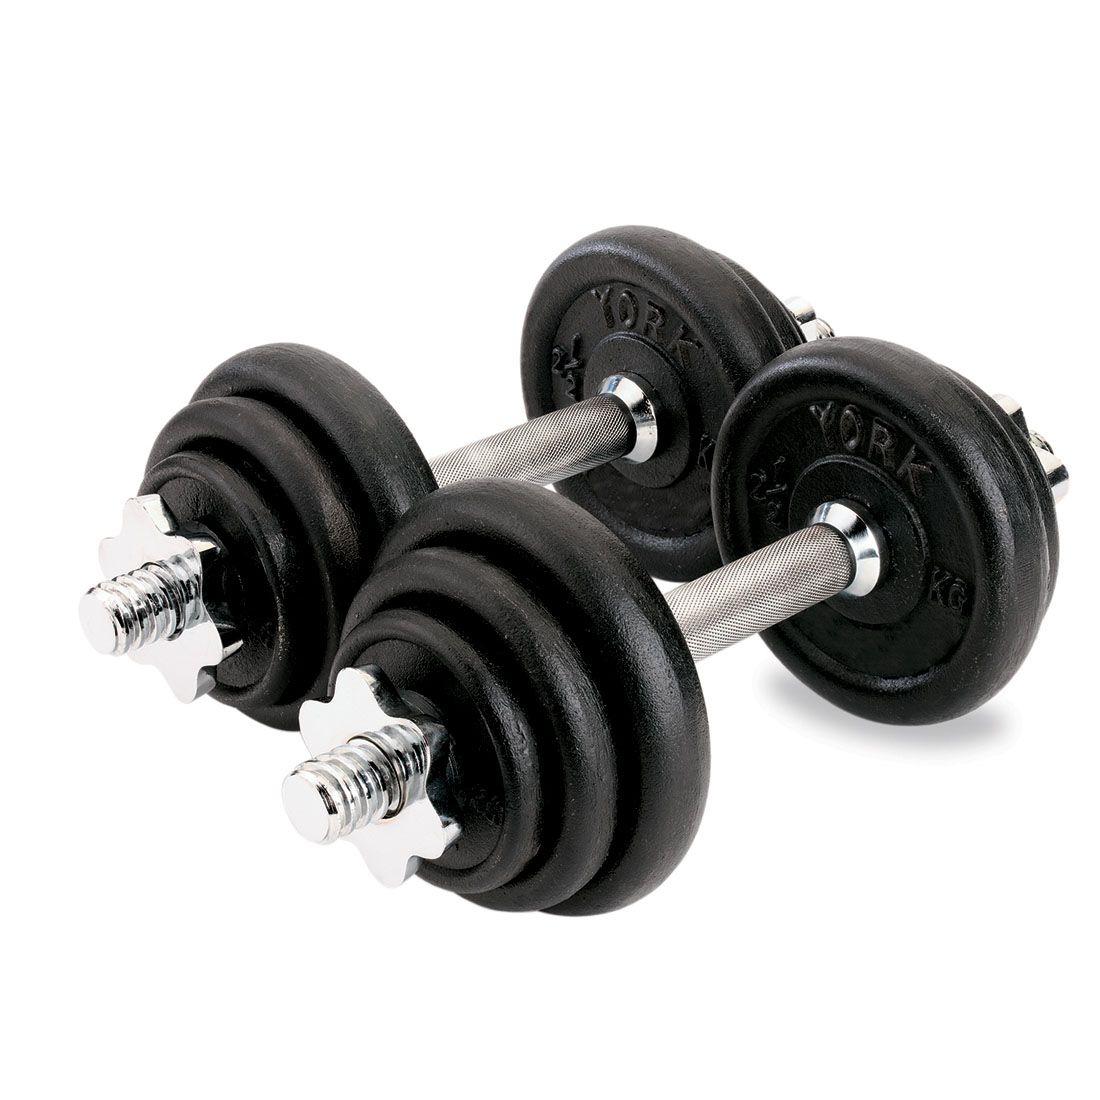 York Adjustable Dumbbells: York 20kg Black Cast Iron Dumbbell Set